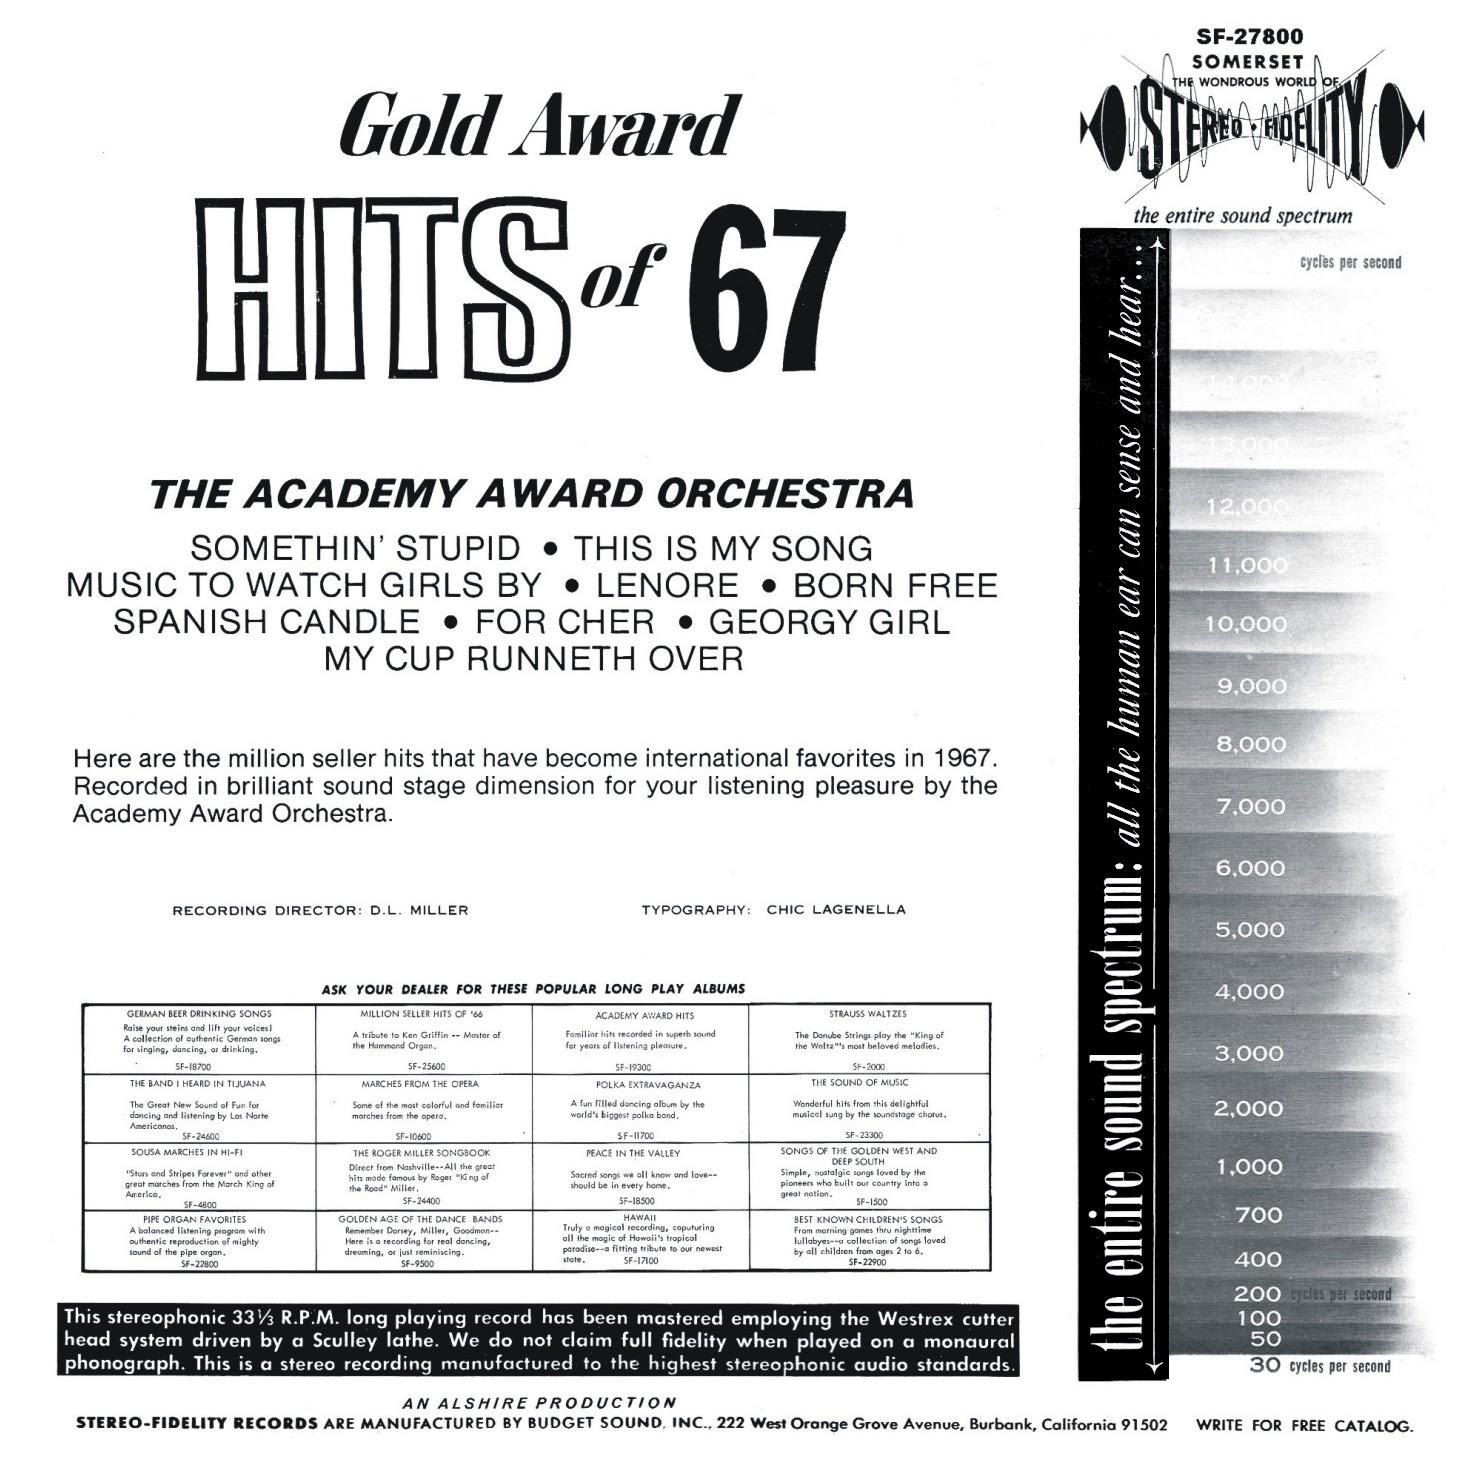 The Academy Award Orchestra